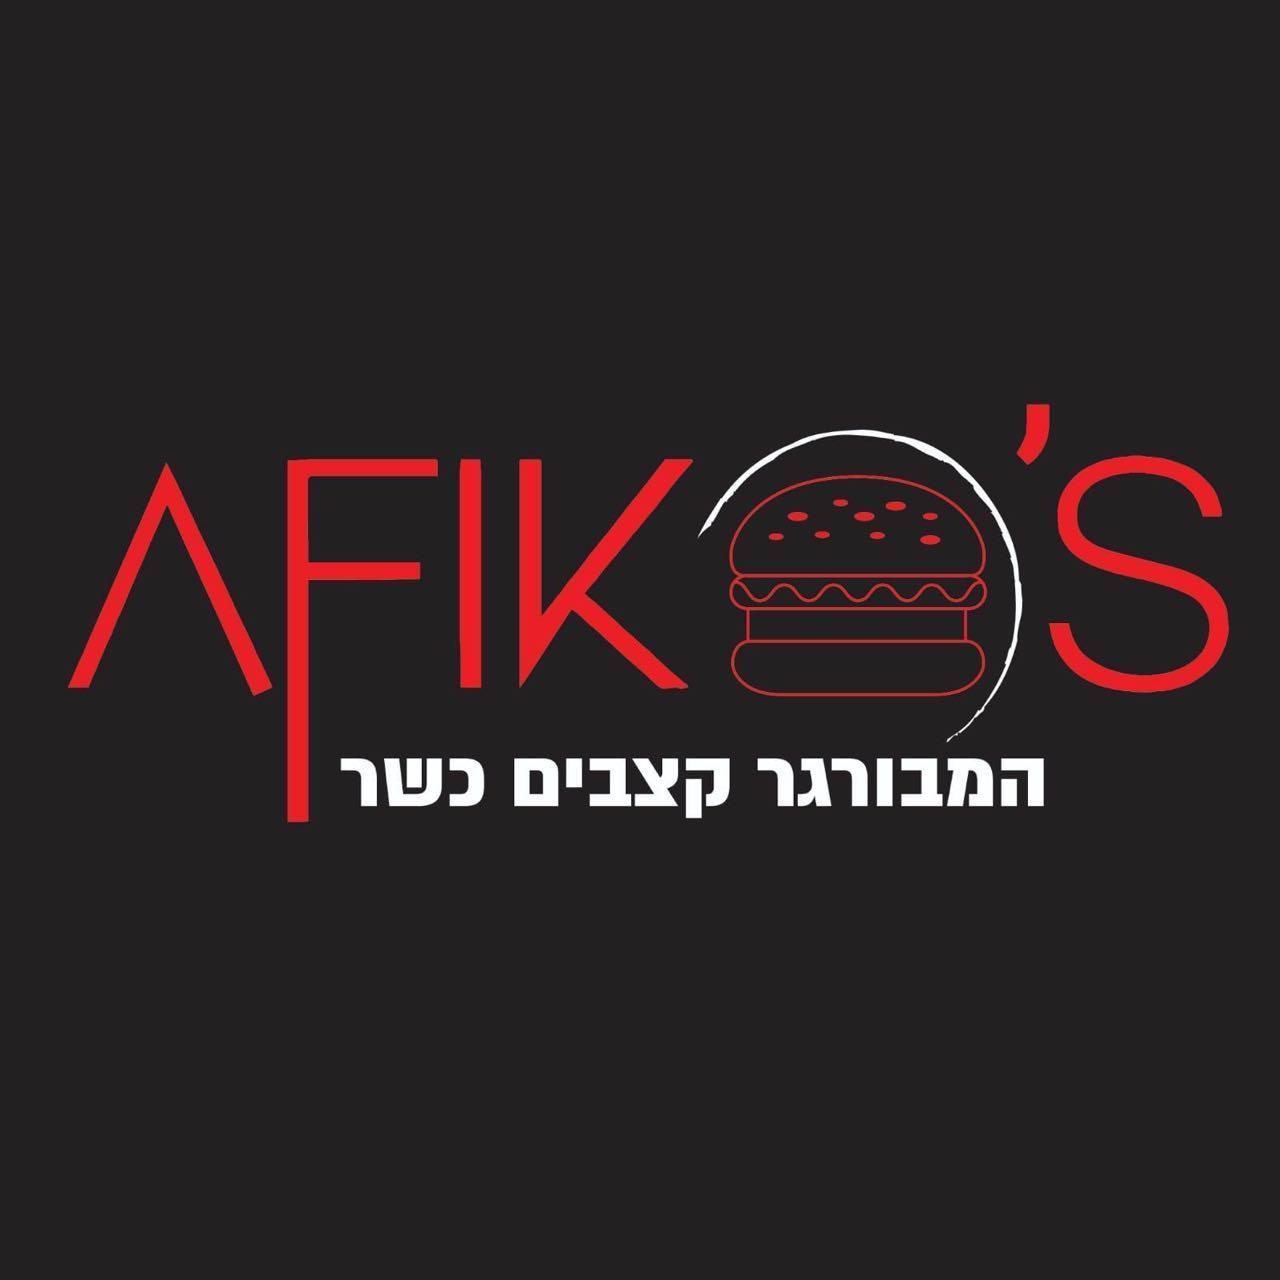 AFIKO'S המבורגר קצבים לוגו